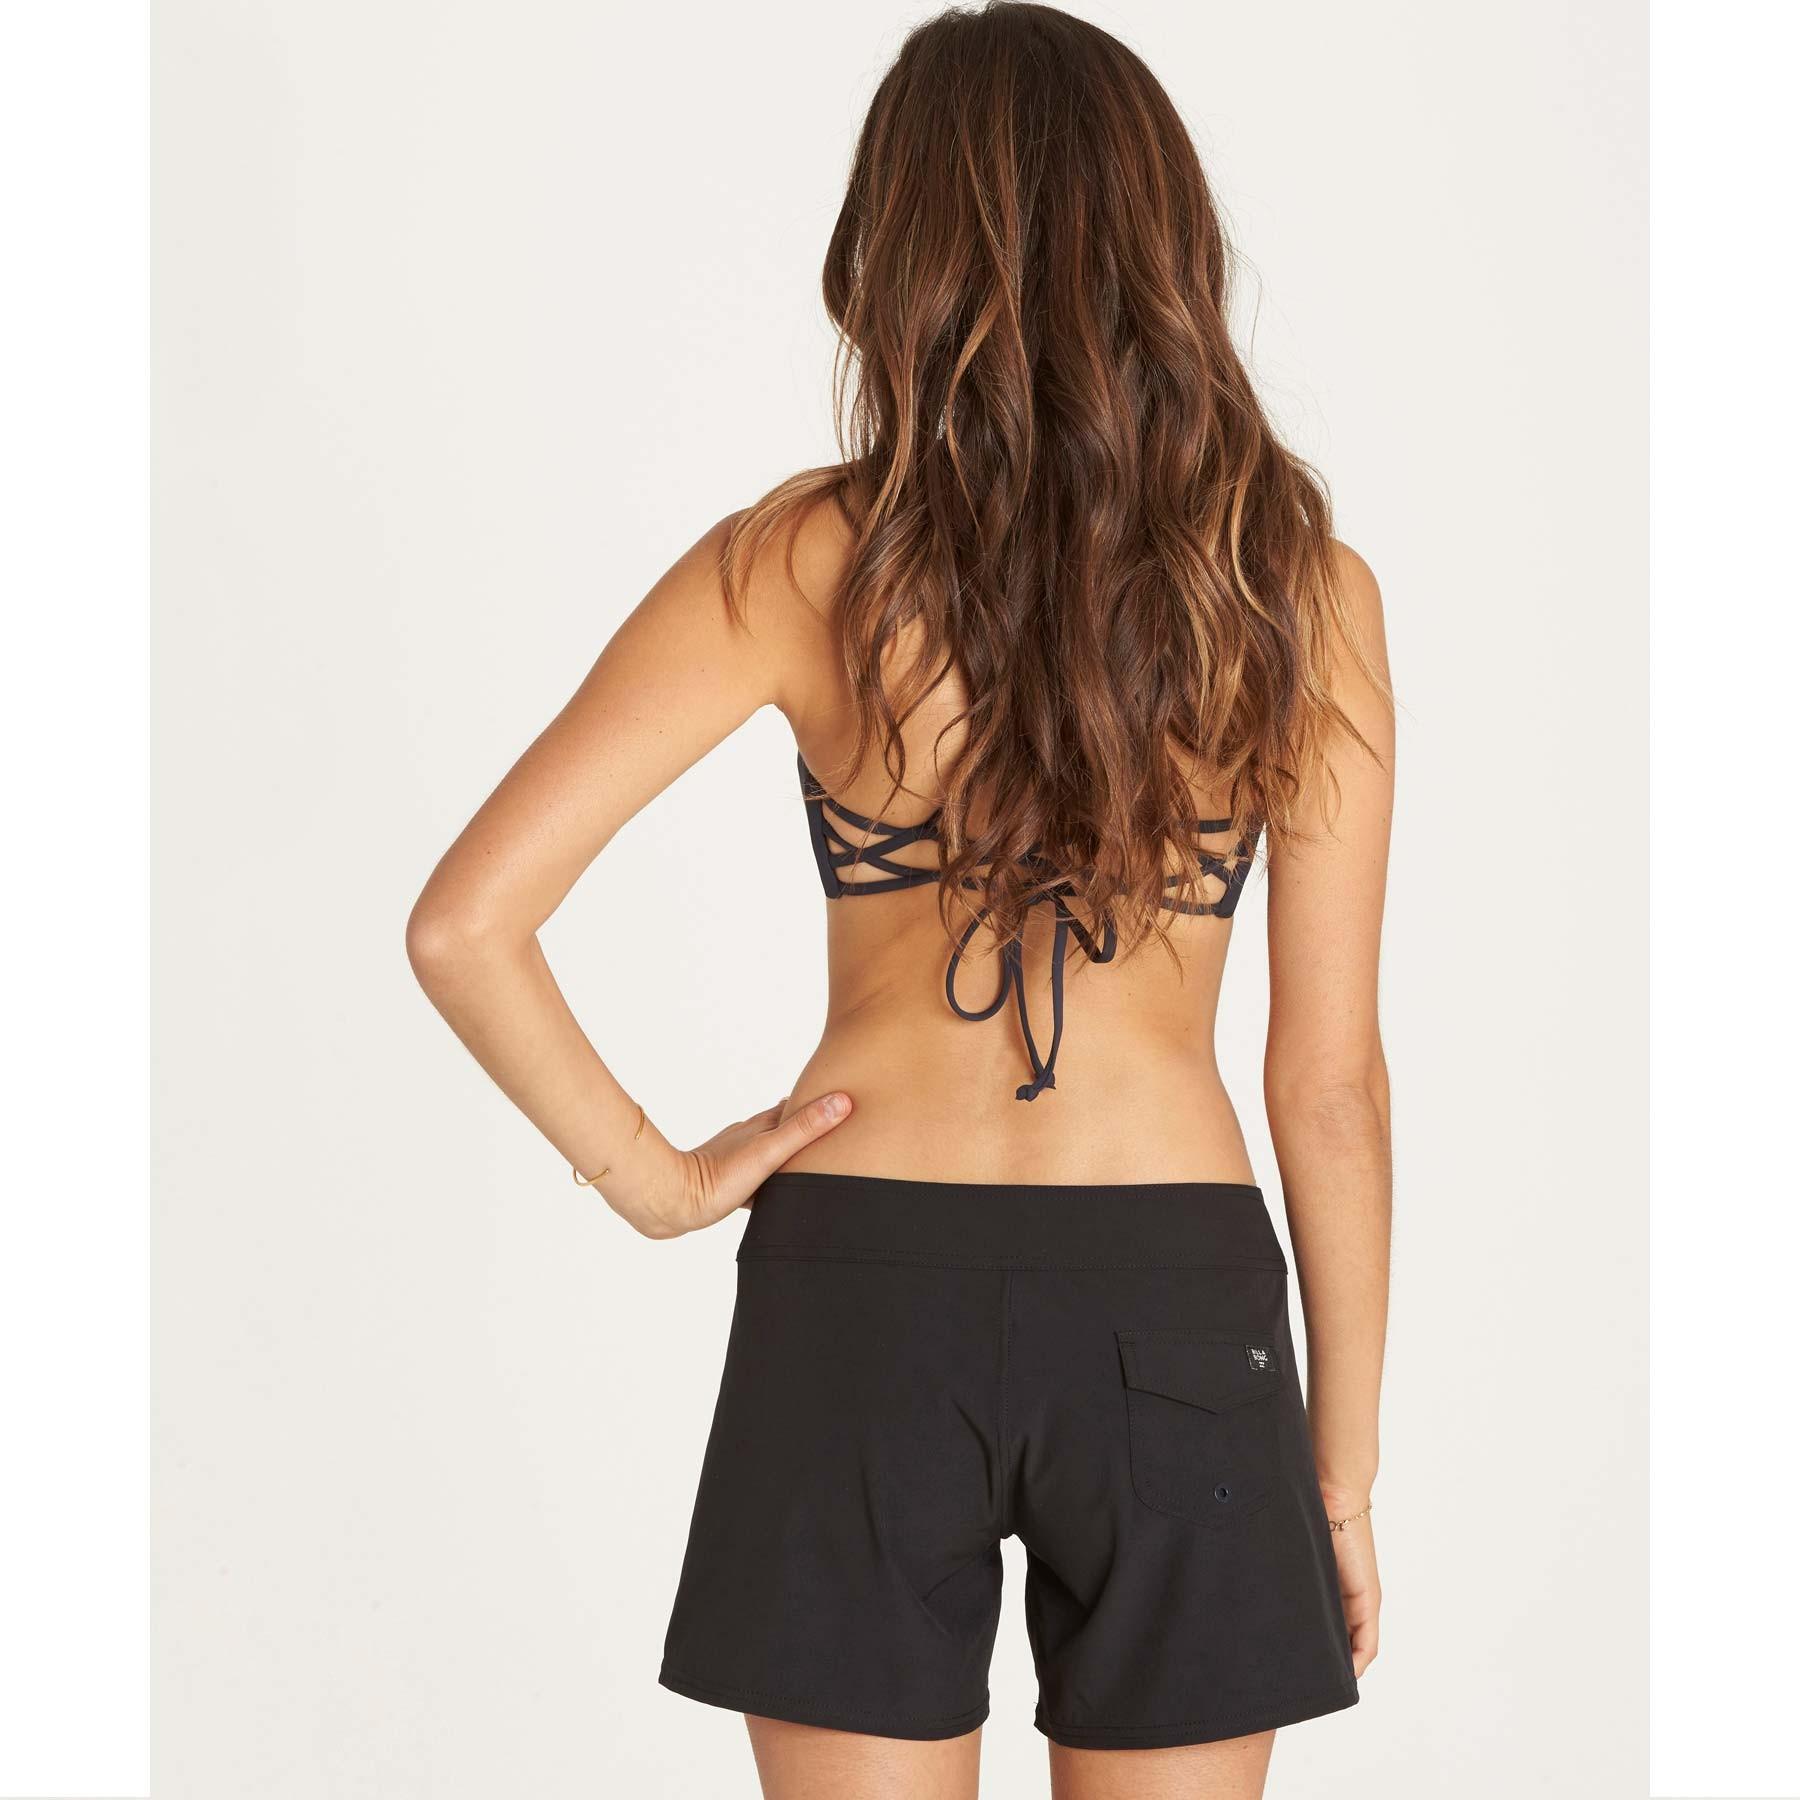 Billabong Sol Searcher 5 Inch Boardshorts (Women's)